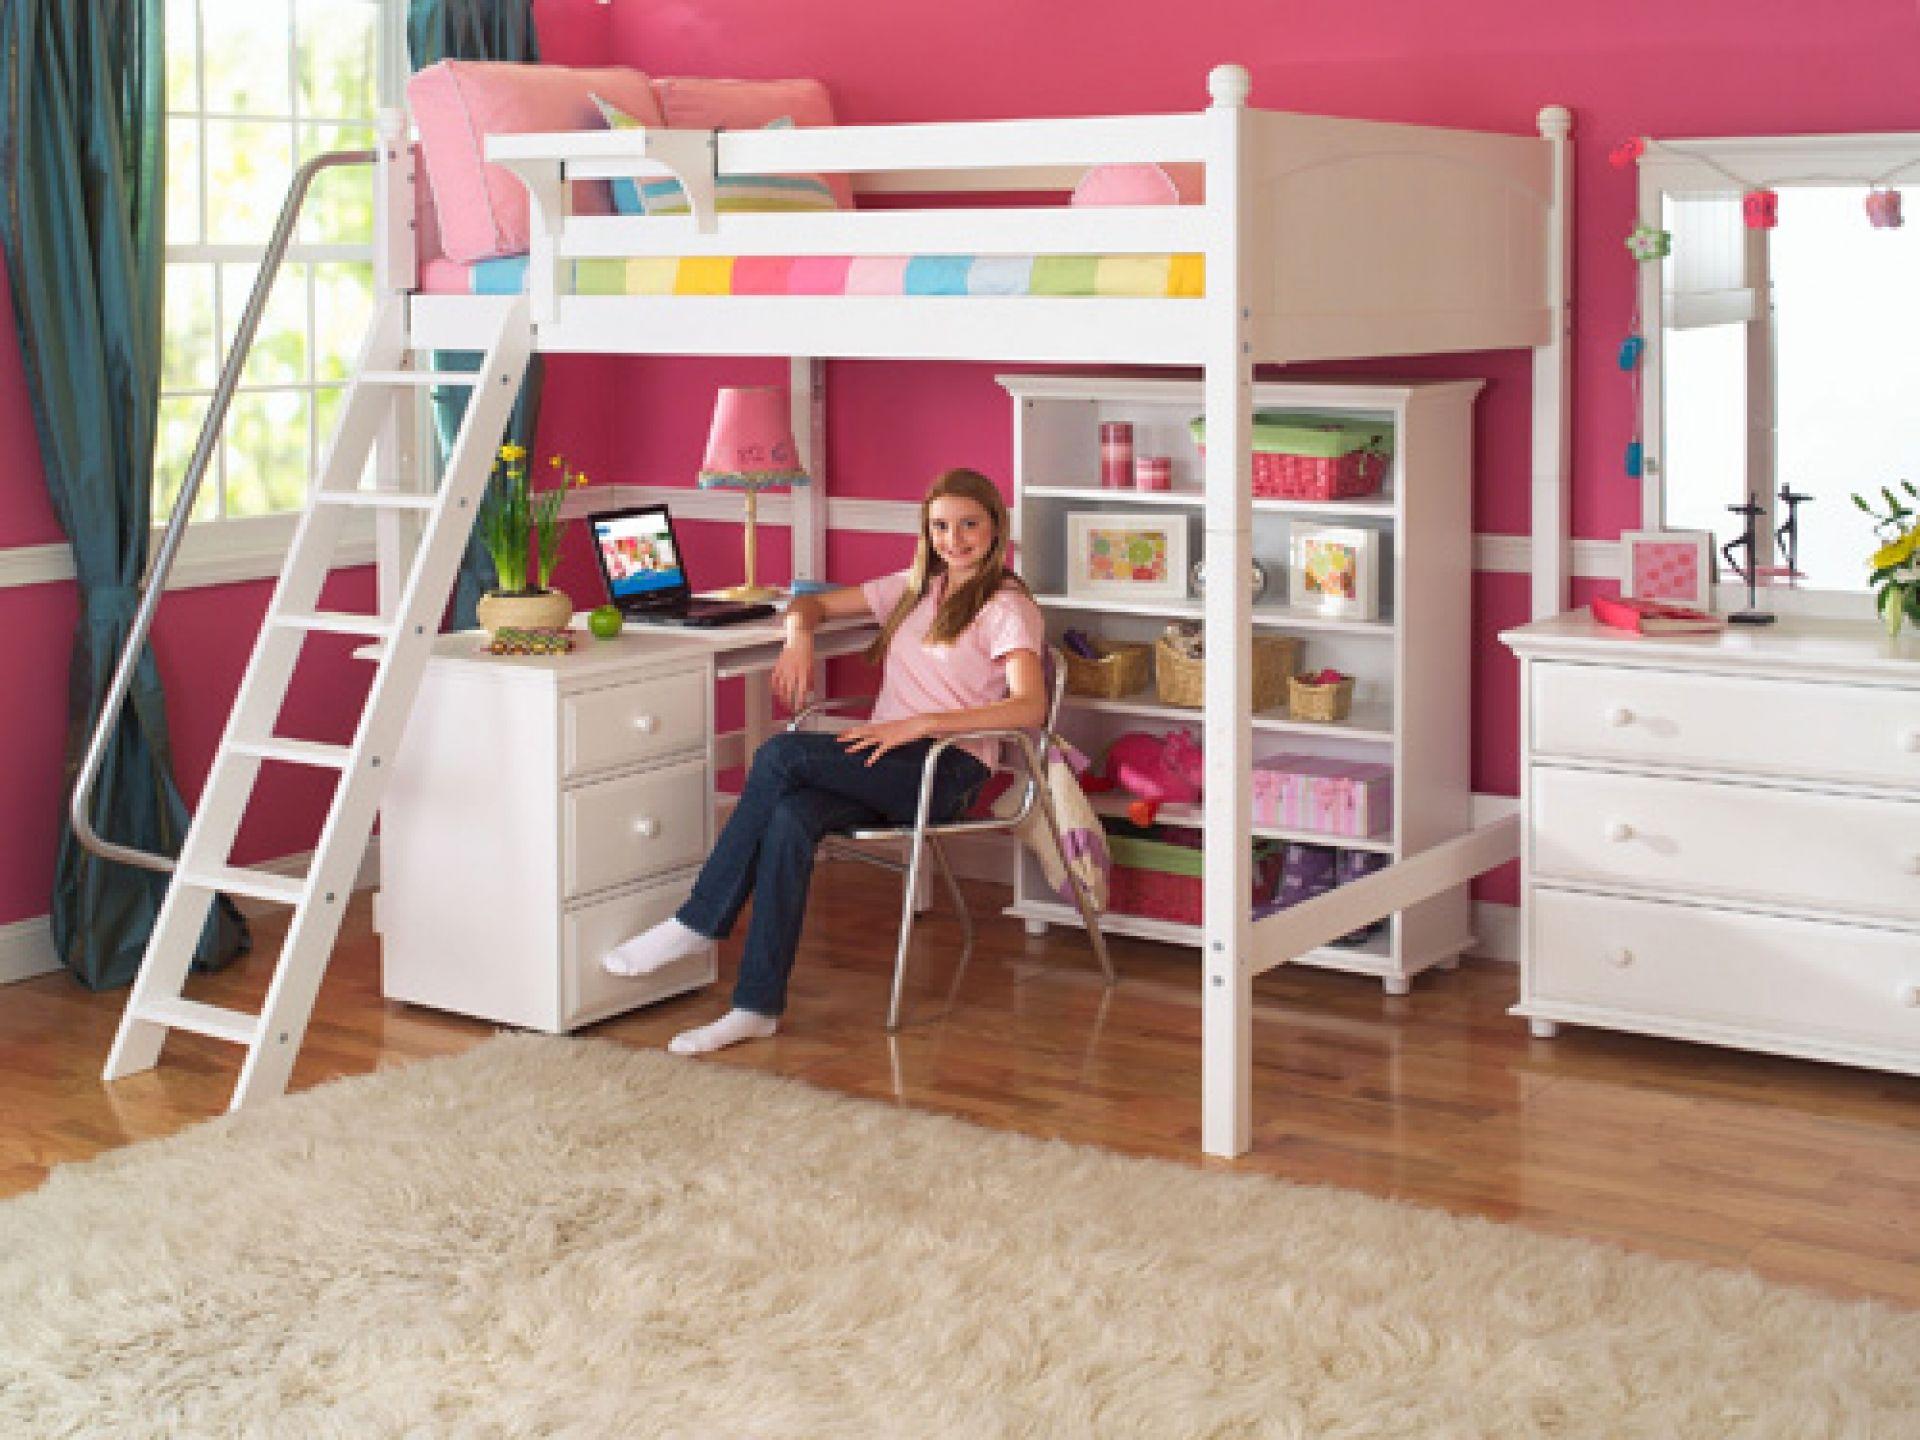 4 bedroom loft  Best Loft Beds for Teenage Girls  katrinahousingbest